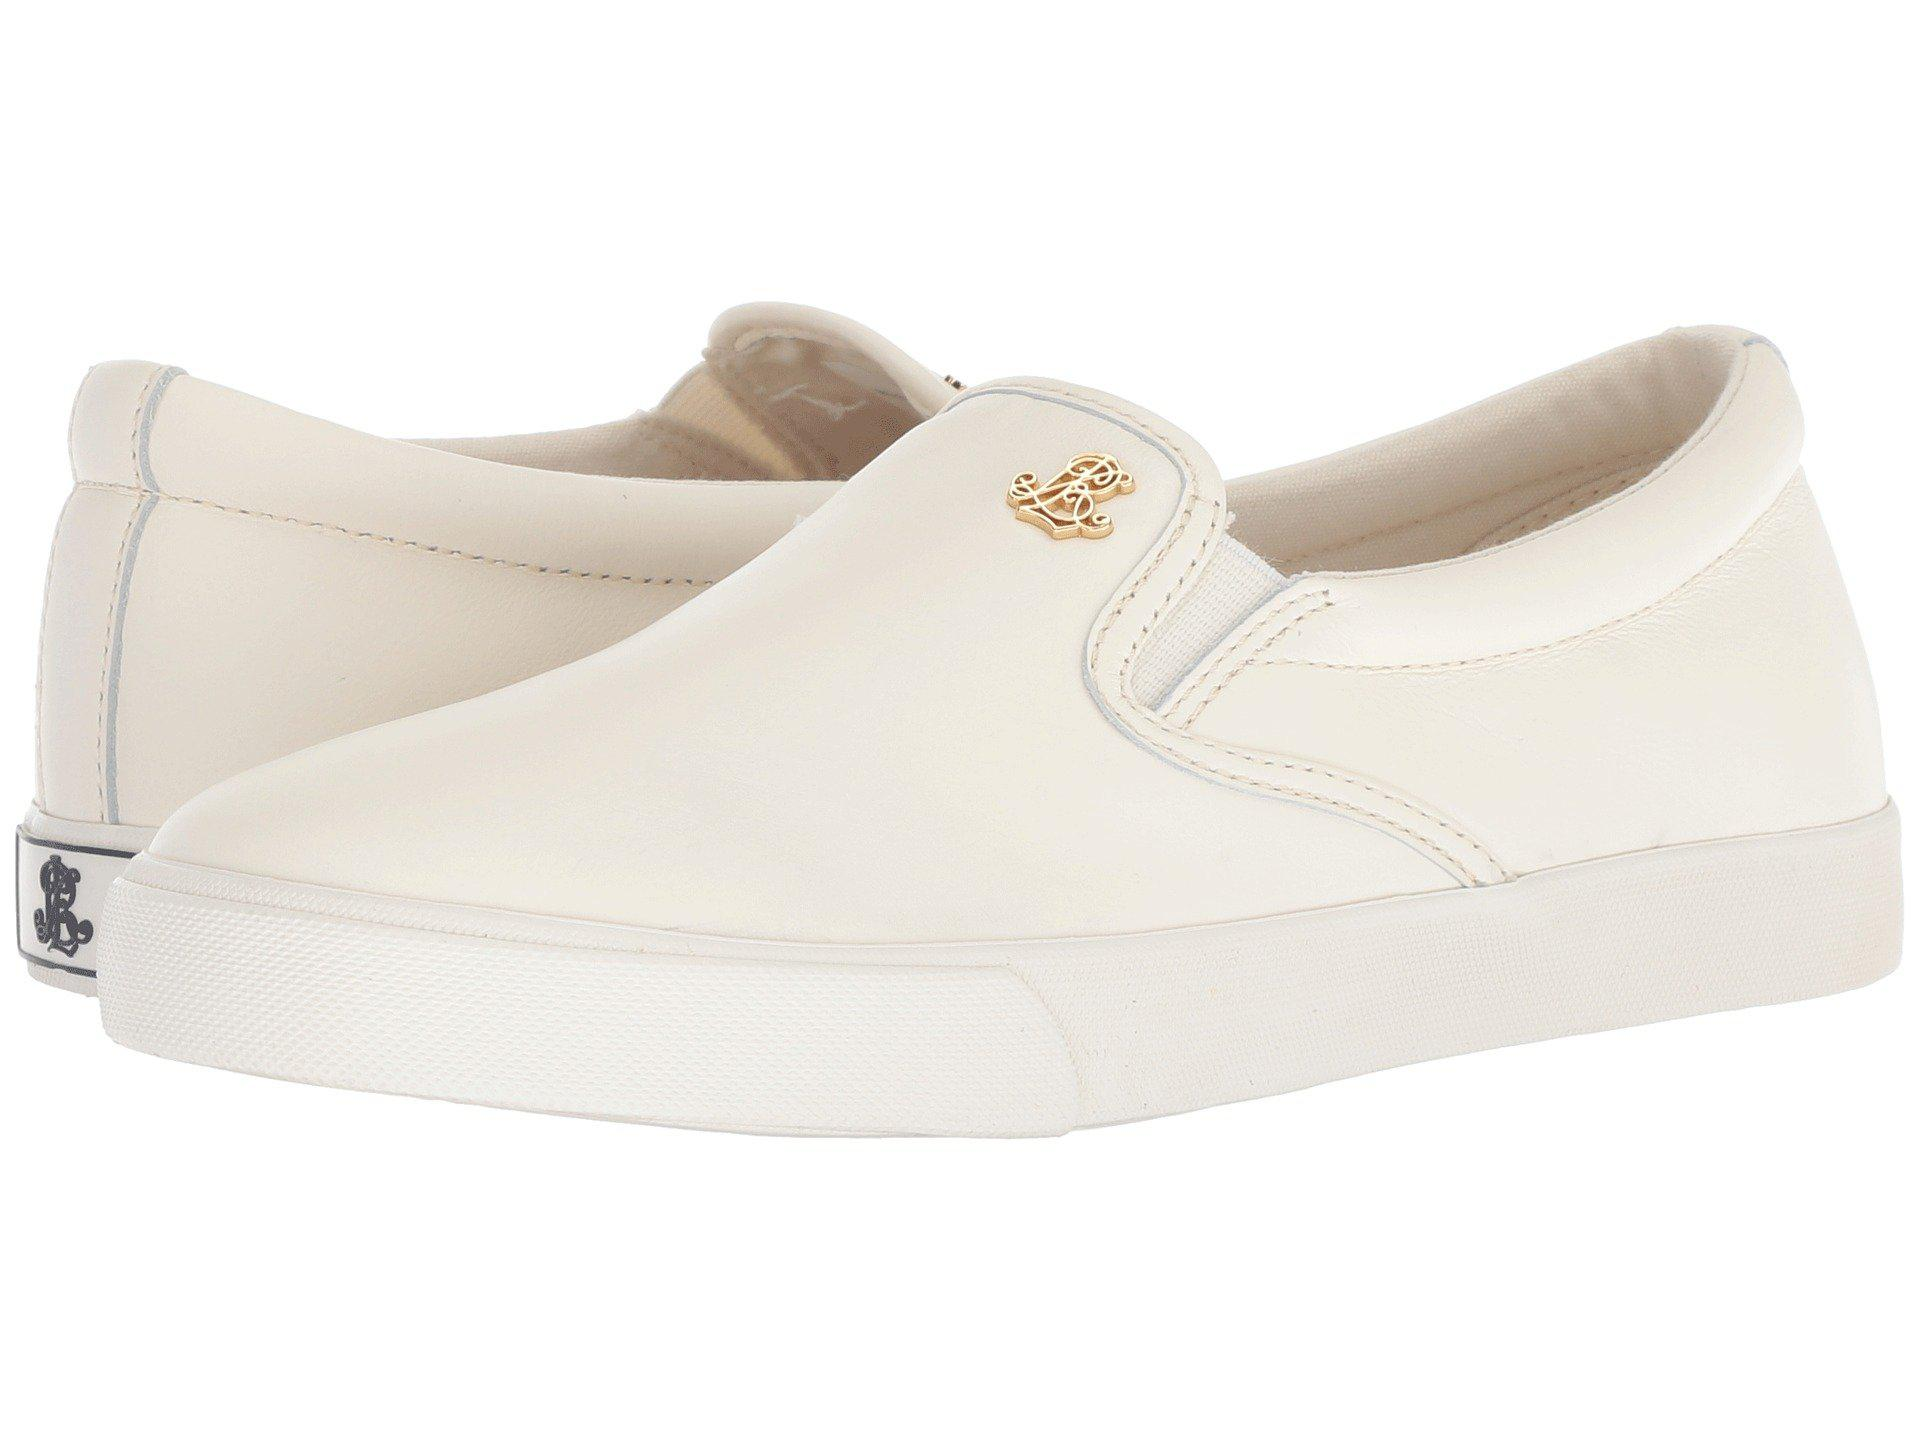 ebc5fa745e Lauren by Ralph Lauren Natural Ria (artist Cream Super Soft Leather)  Women's Shoes